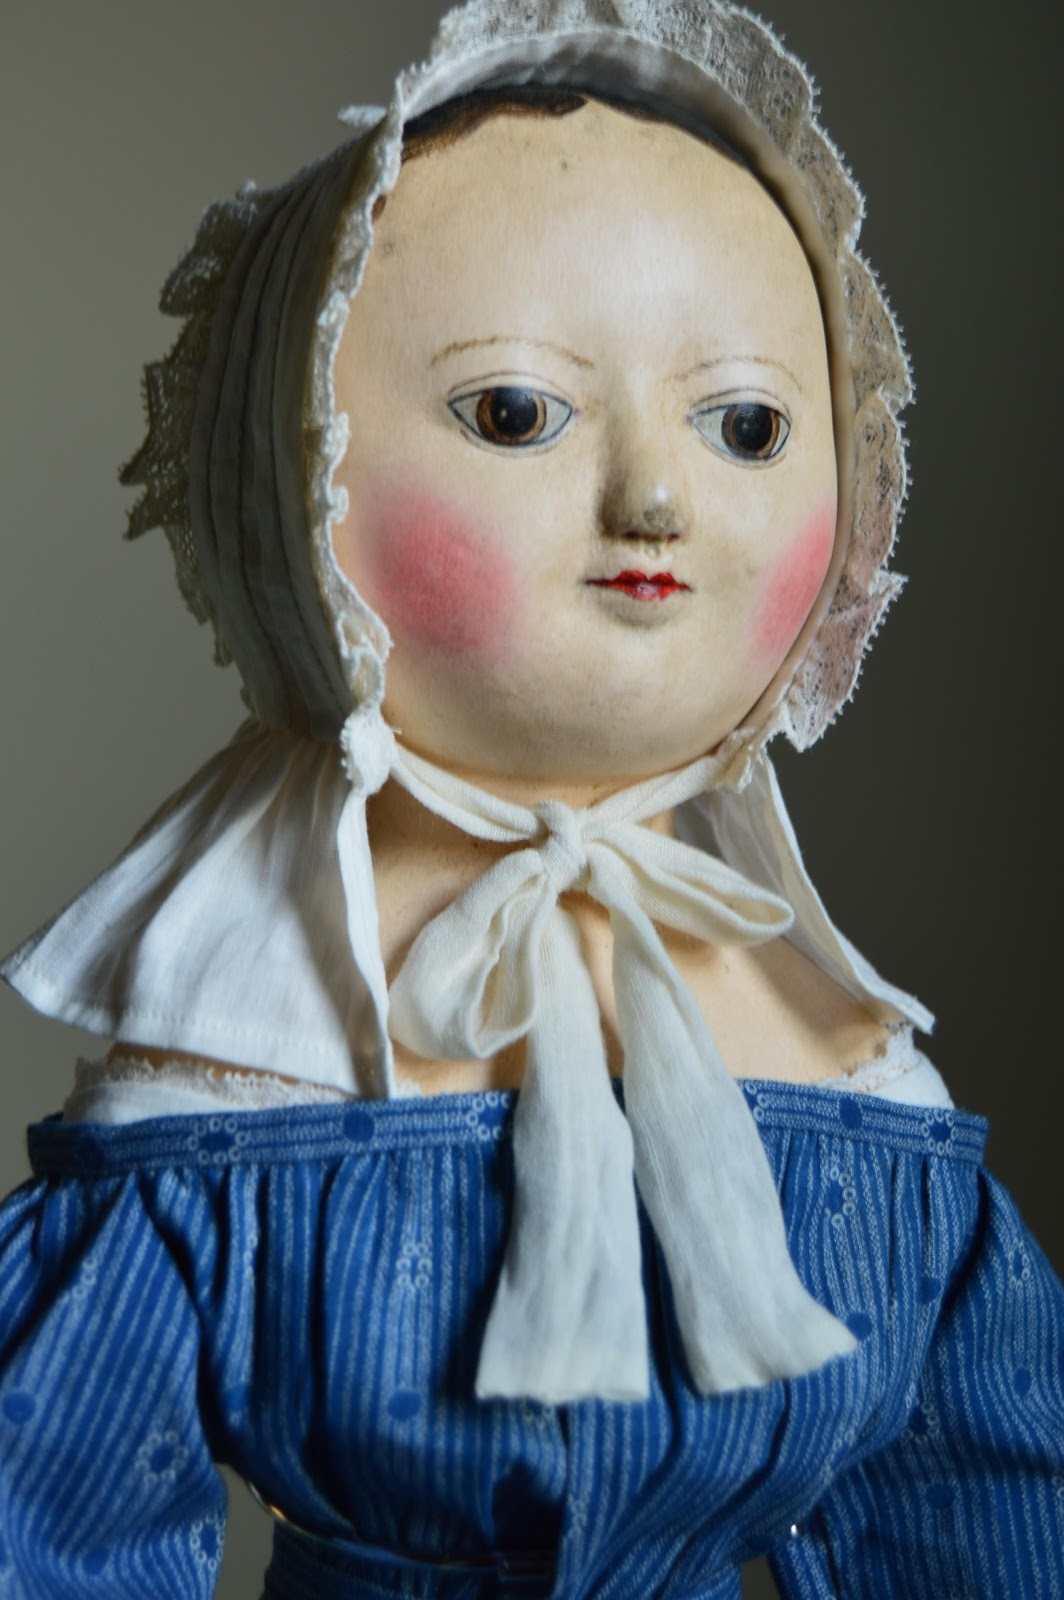 art dolls historically inspired izannah walker doll reproduction rh newenglanddolls com izannah walker doll kit izannah walker doll kit